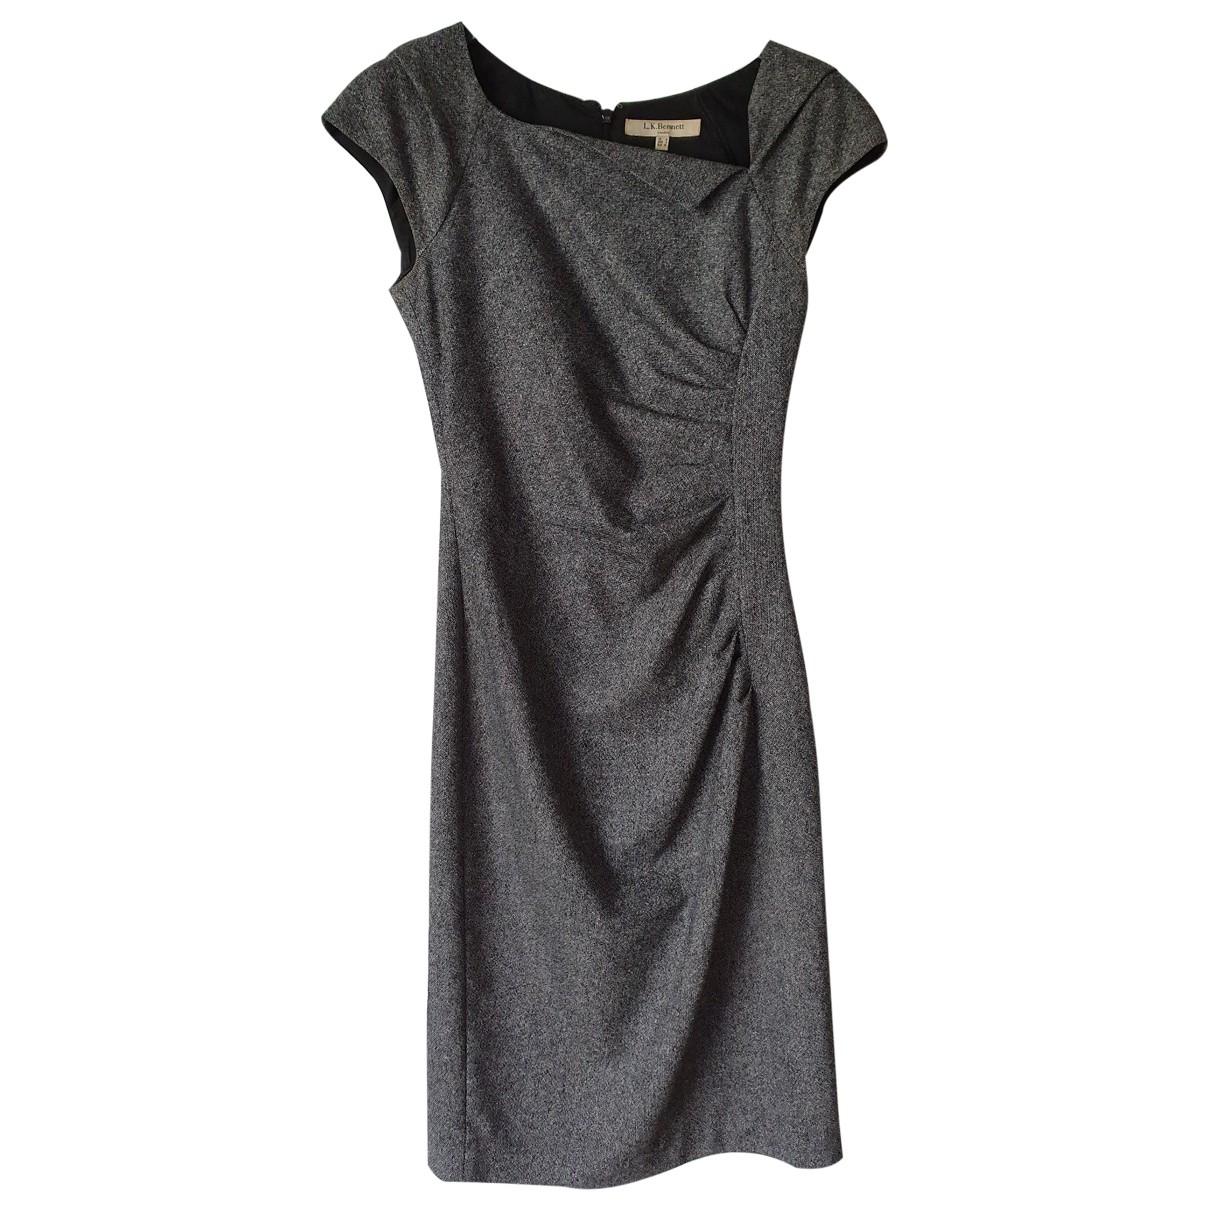 Lk Bennett \N Kleid in  Grau Wolle